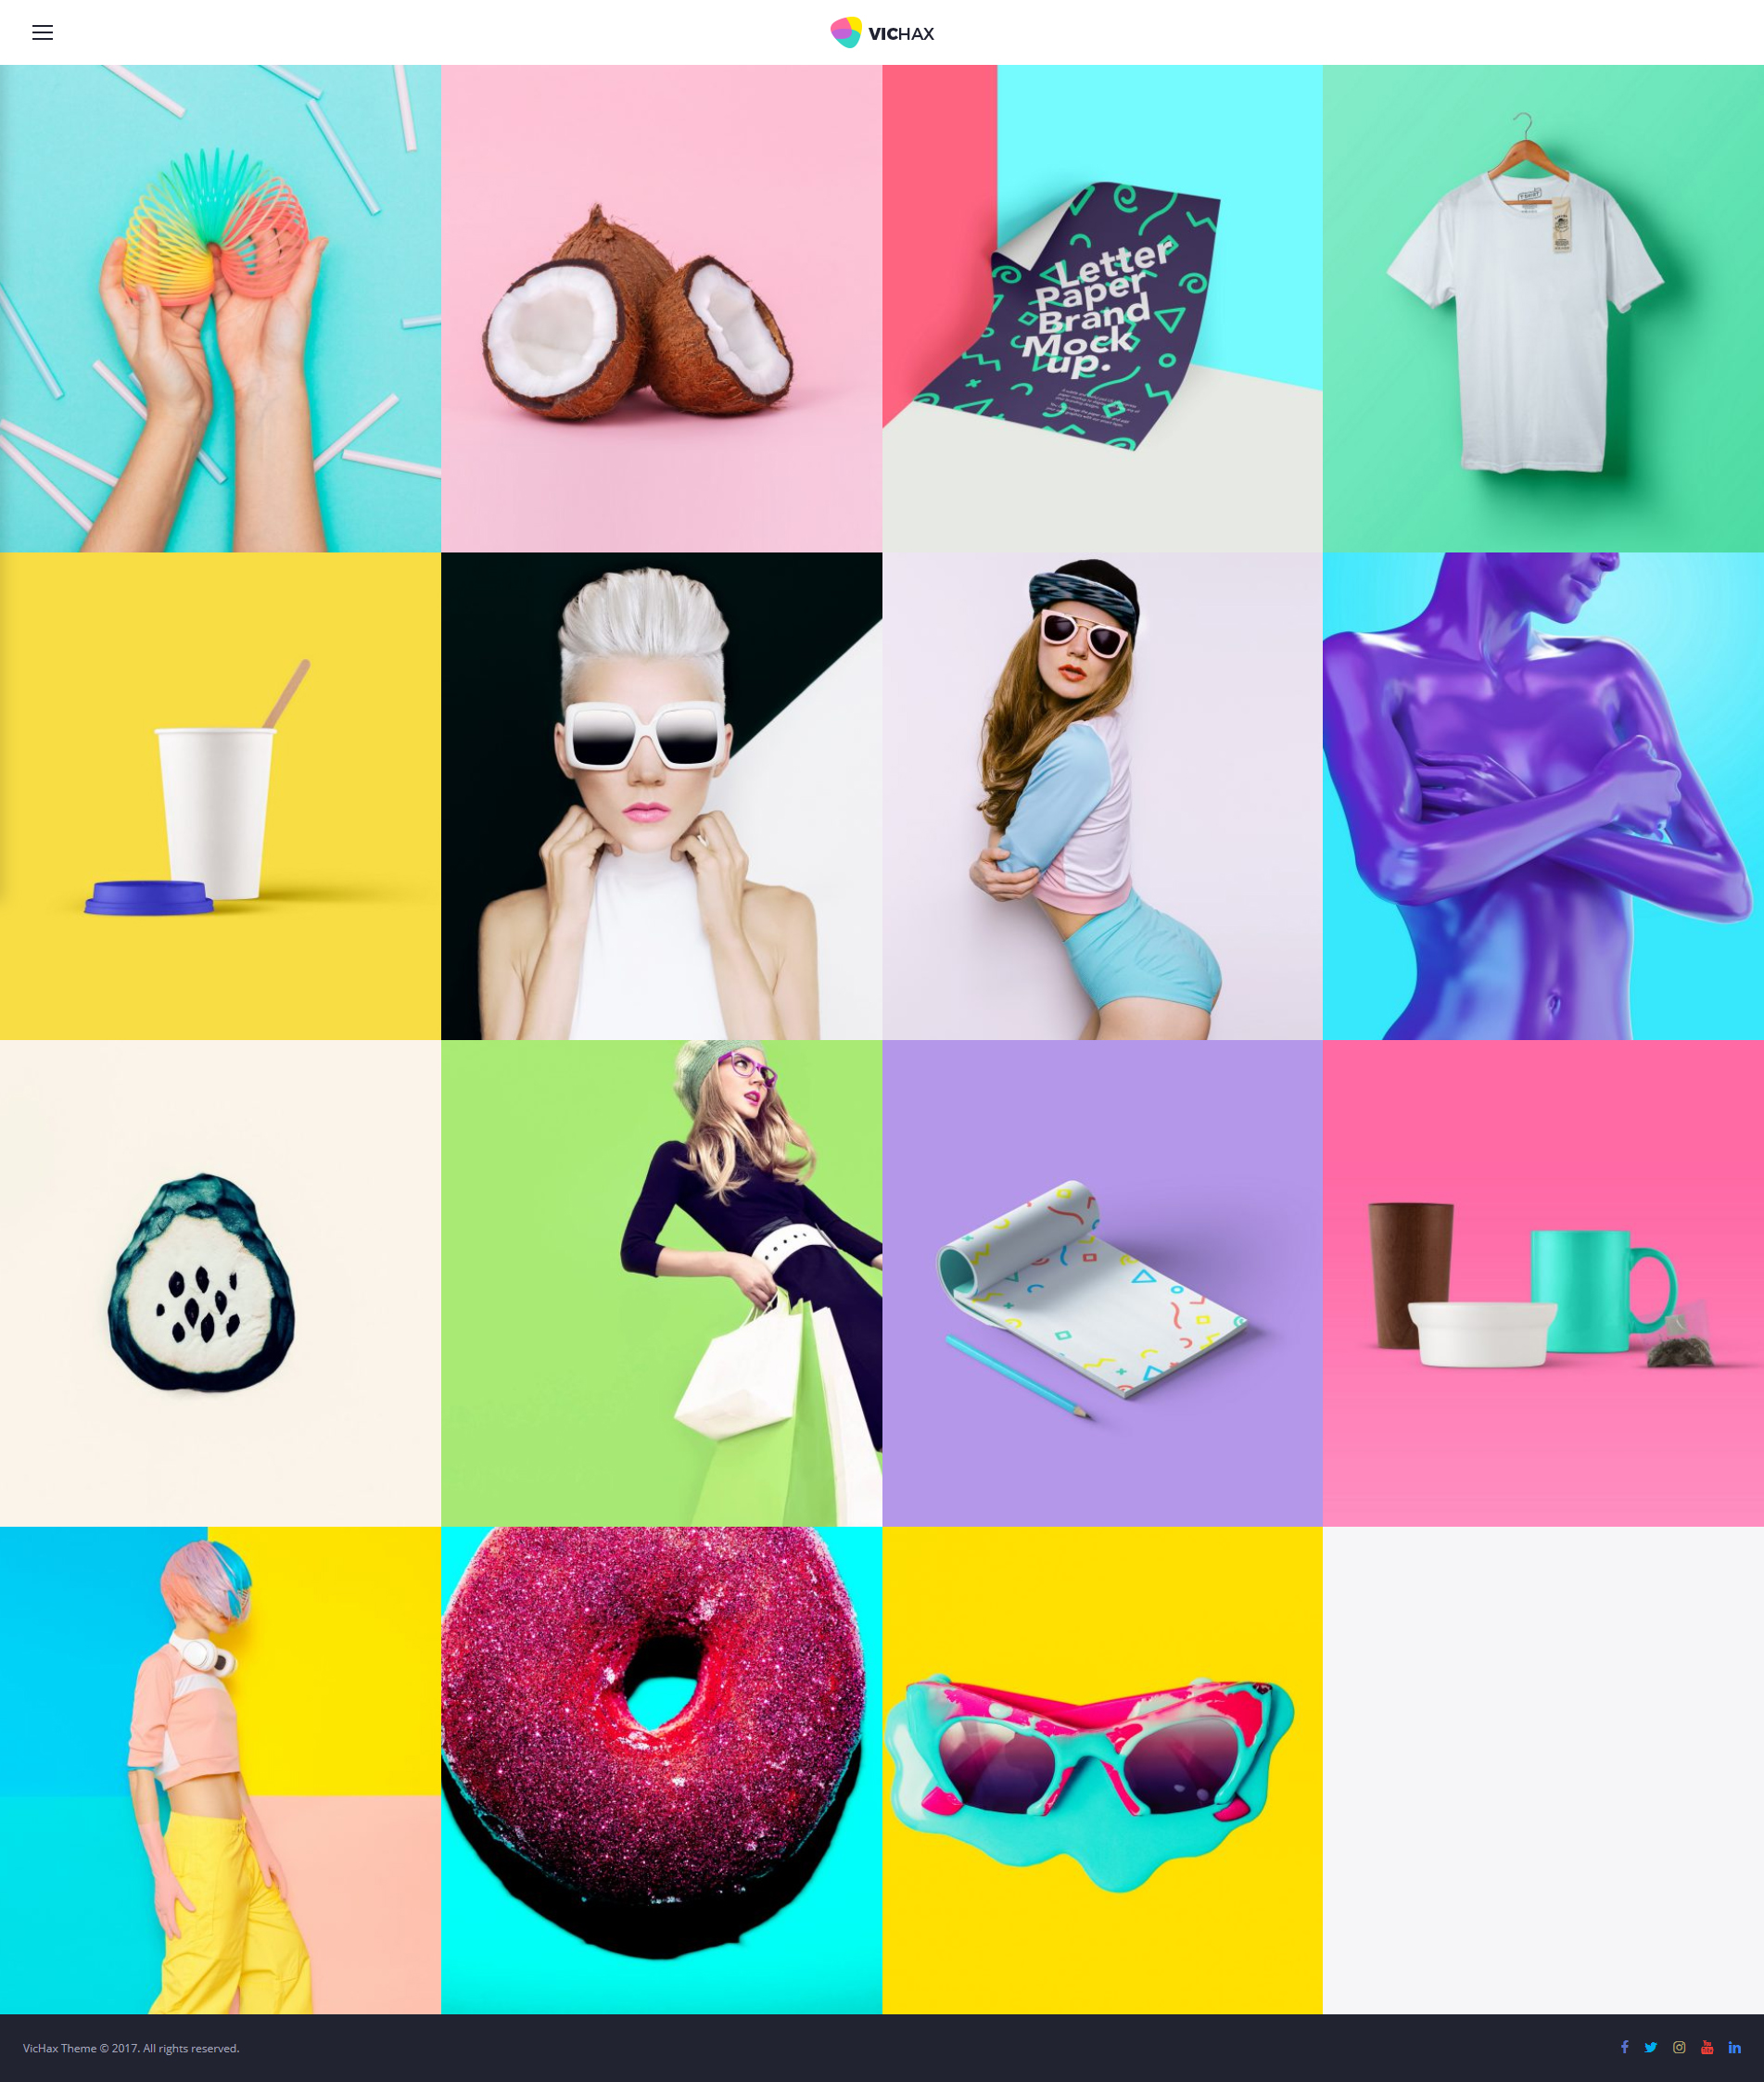 VicHax - Designer Portfolio WordPress Theme - screenshot